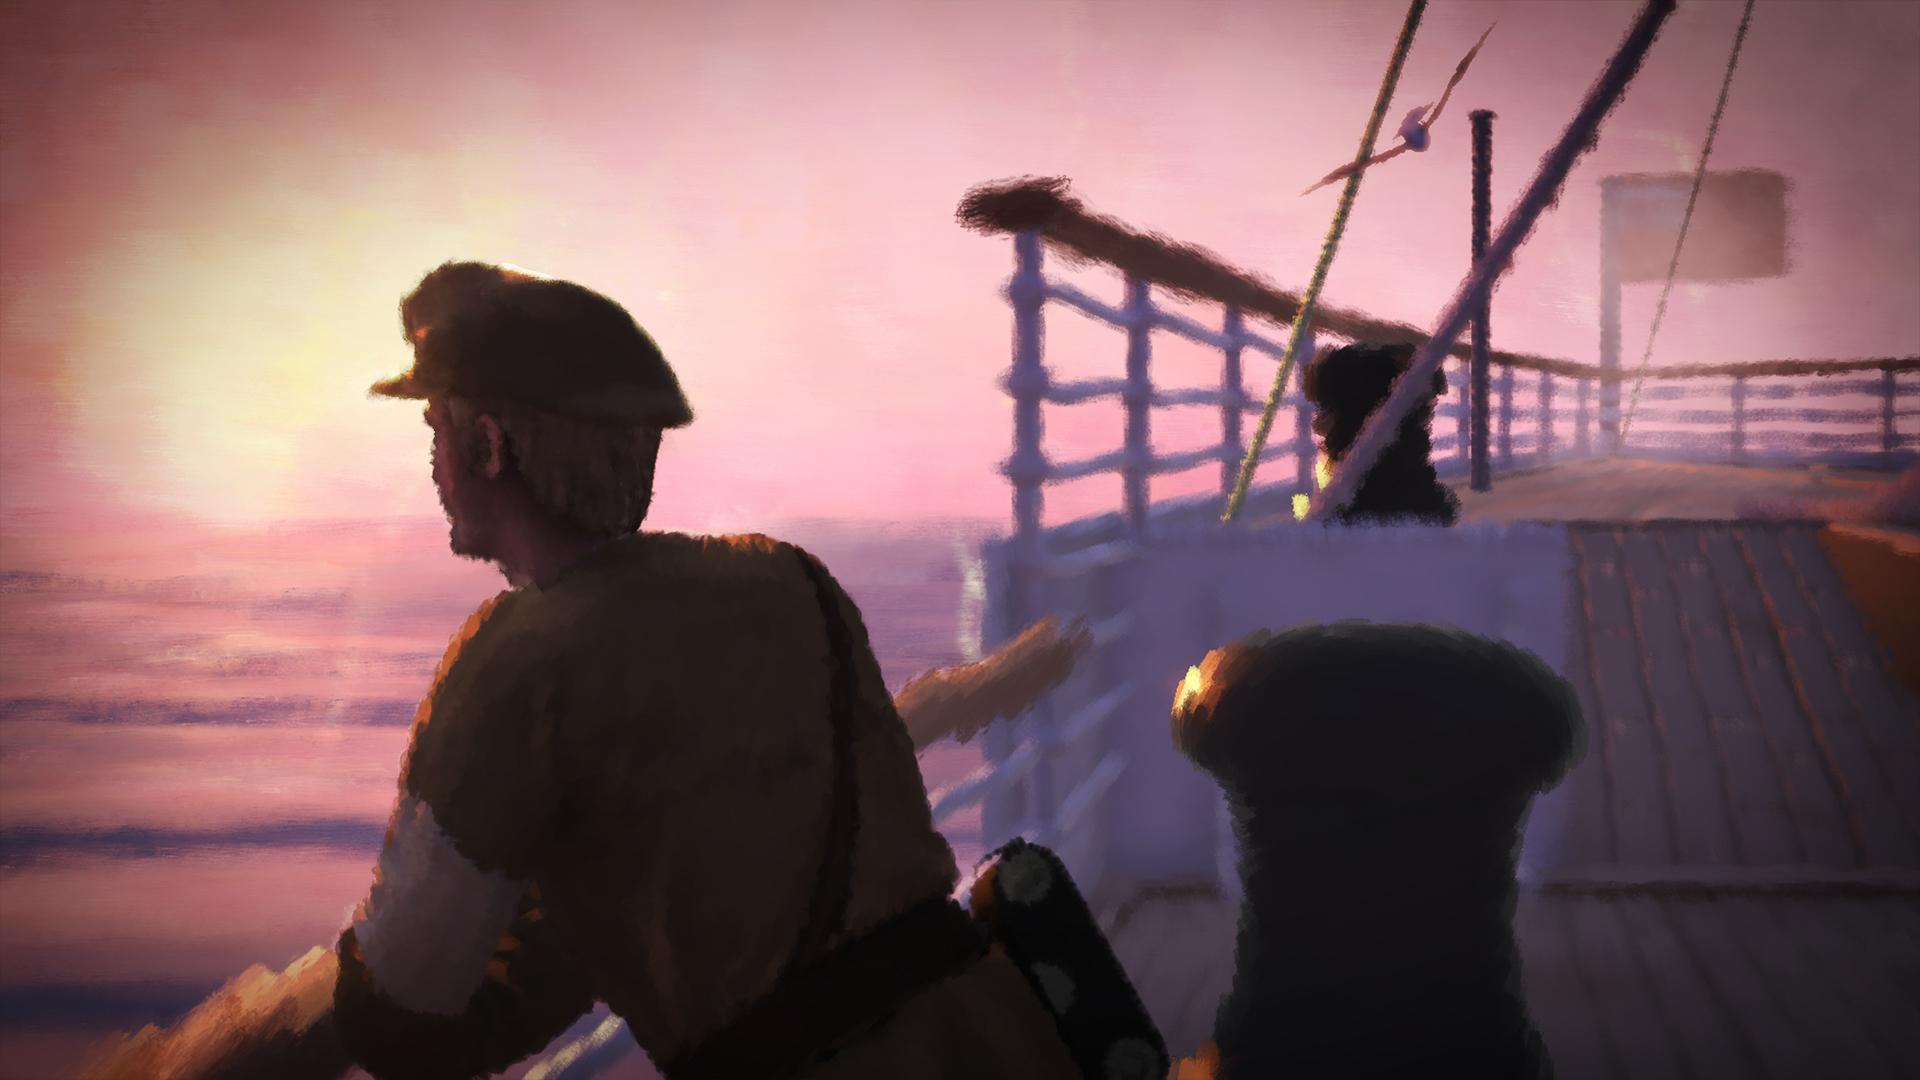 11-11 Memories Retold PS4 Pro Xbox One X Review Kritik Test Bandai Namco Entertainment Anti Kriegsspiel Worldwar I Erster Weltkrieg 1918 11 11 1918 Harry